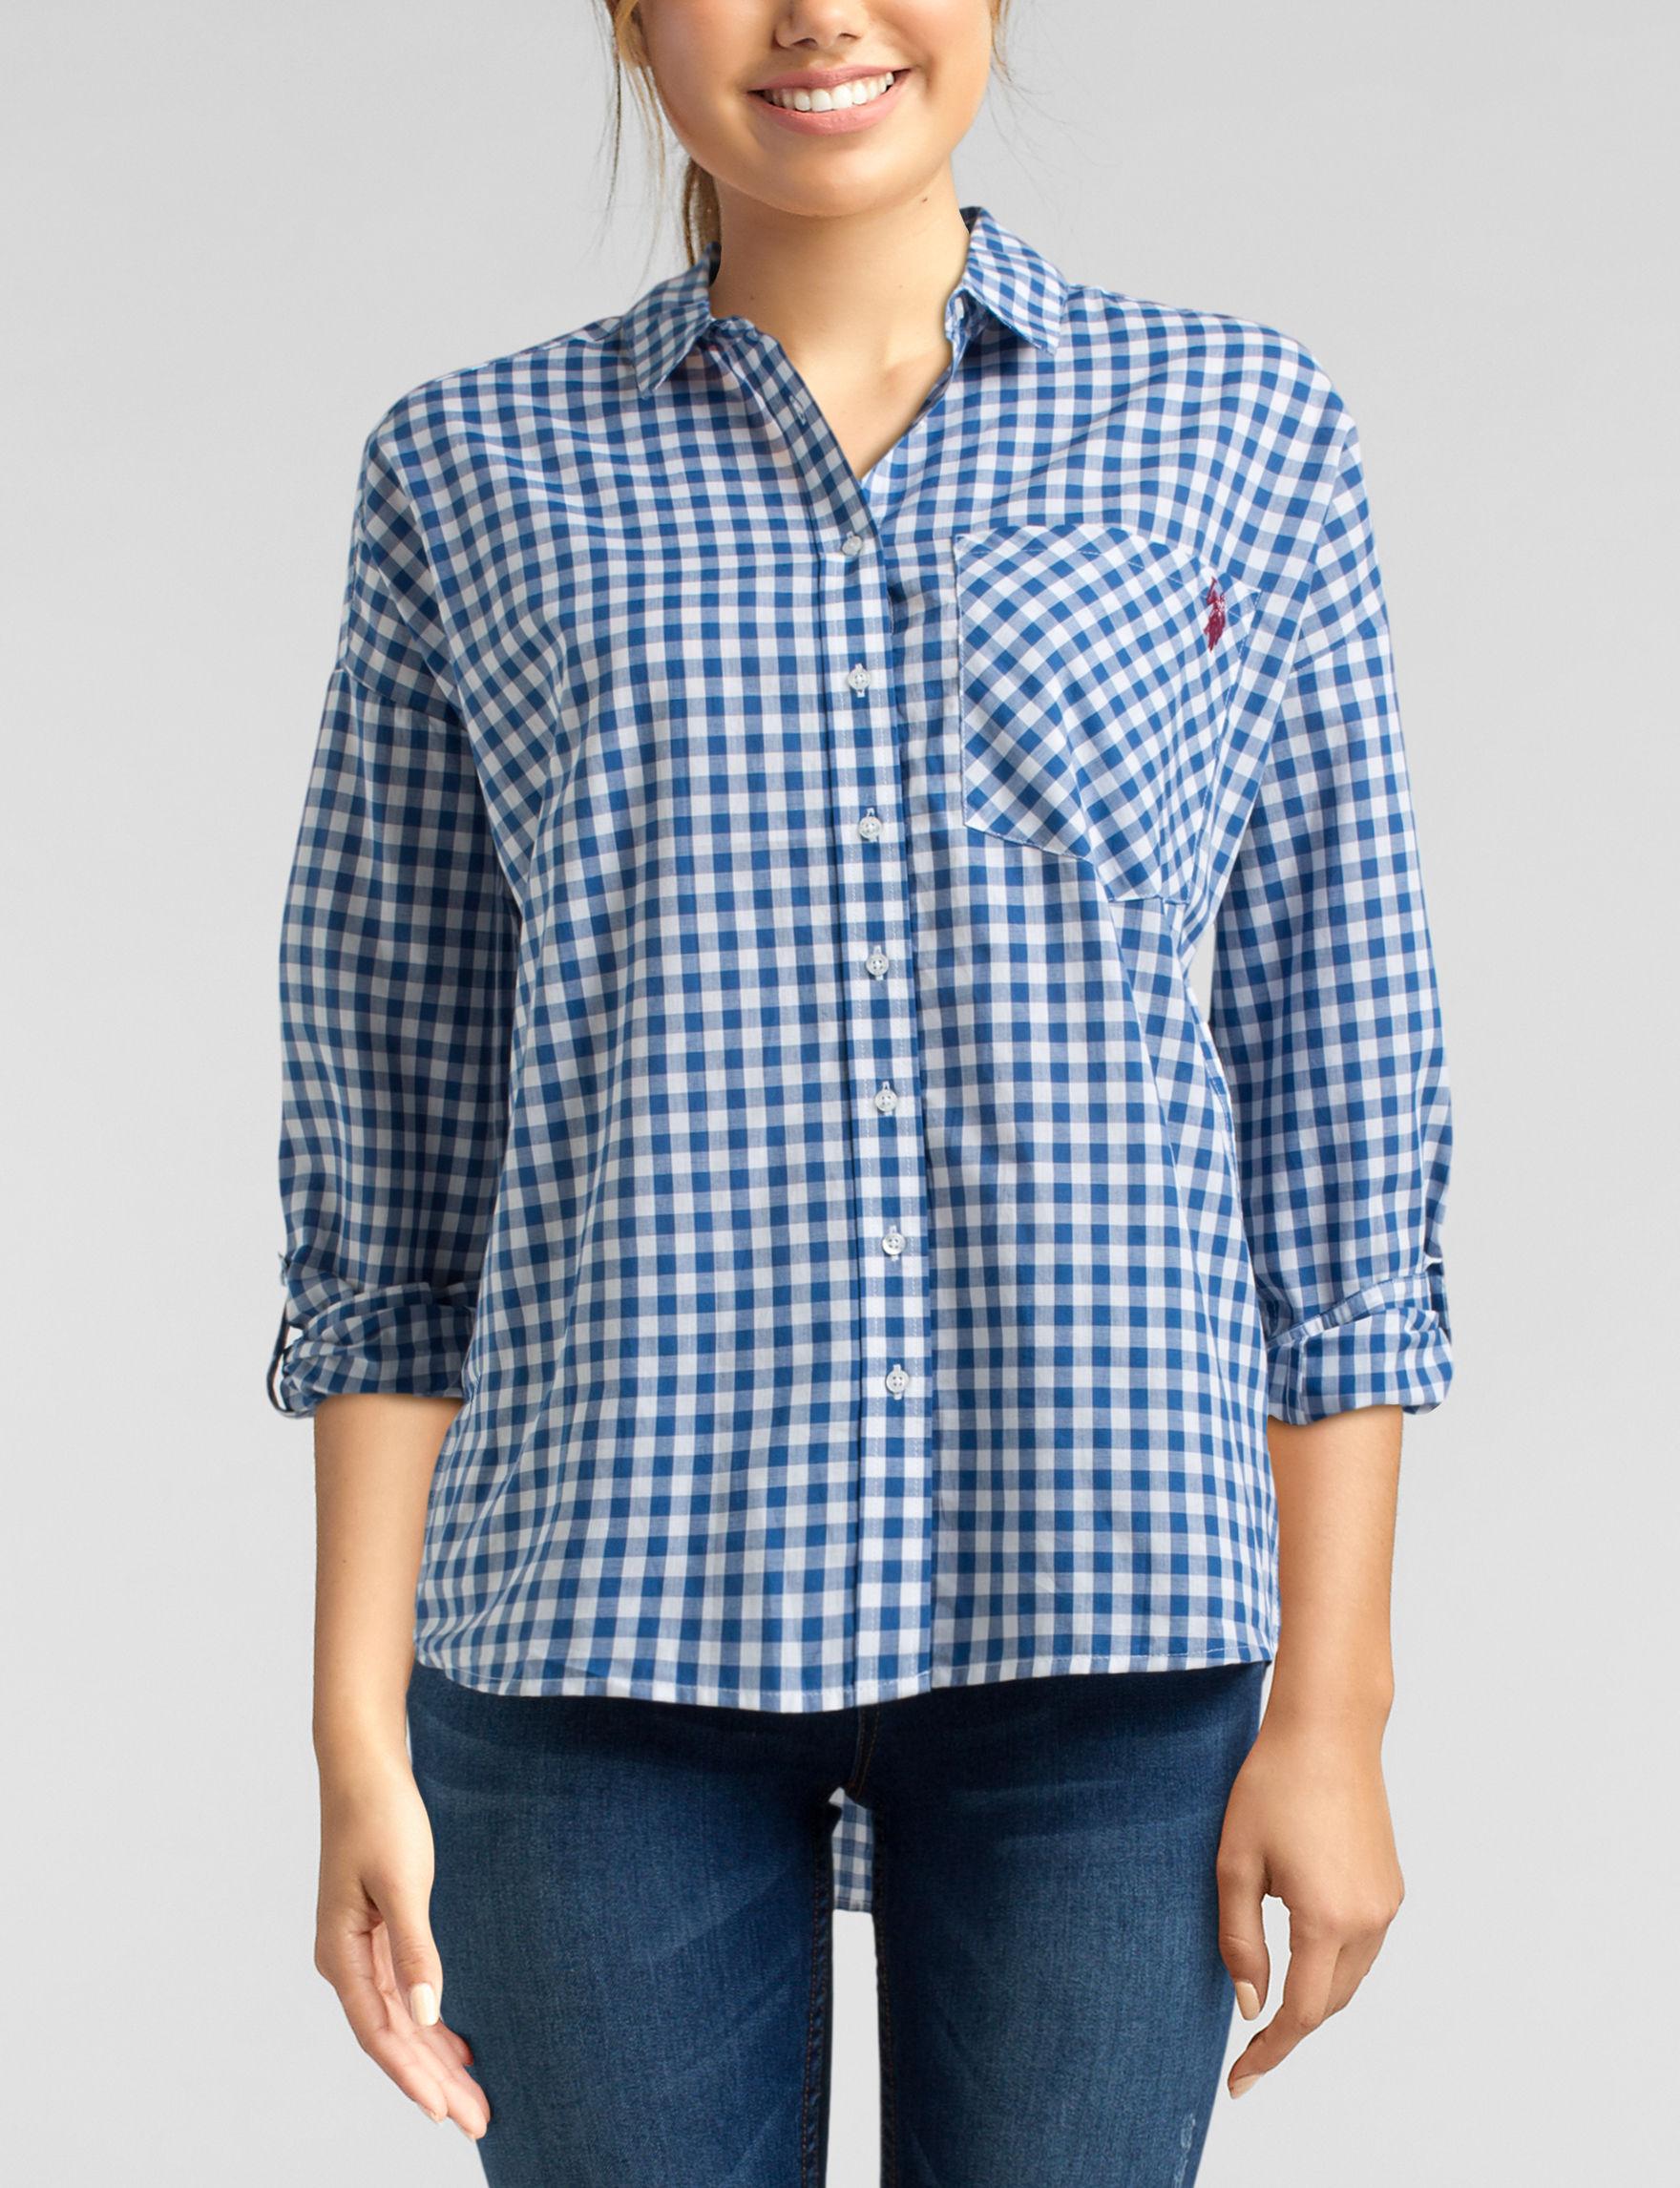 U.S. Polo Assn. White / Navy Shirts & Blouses